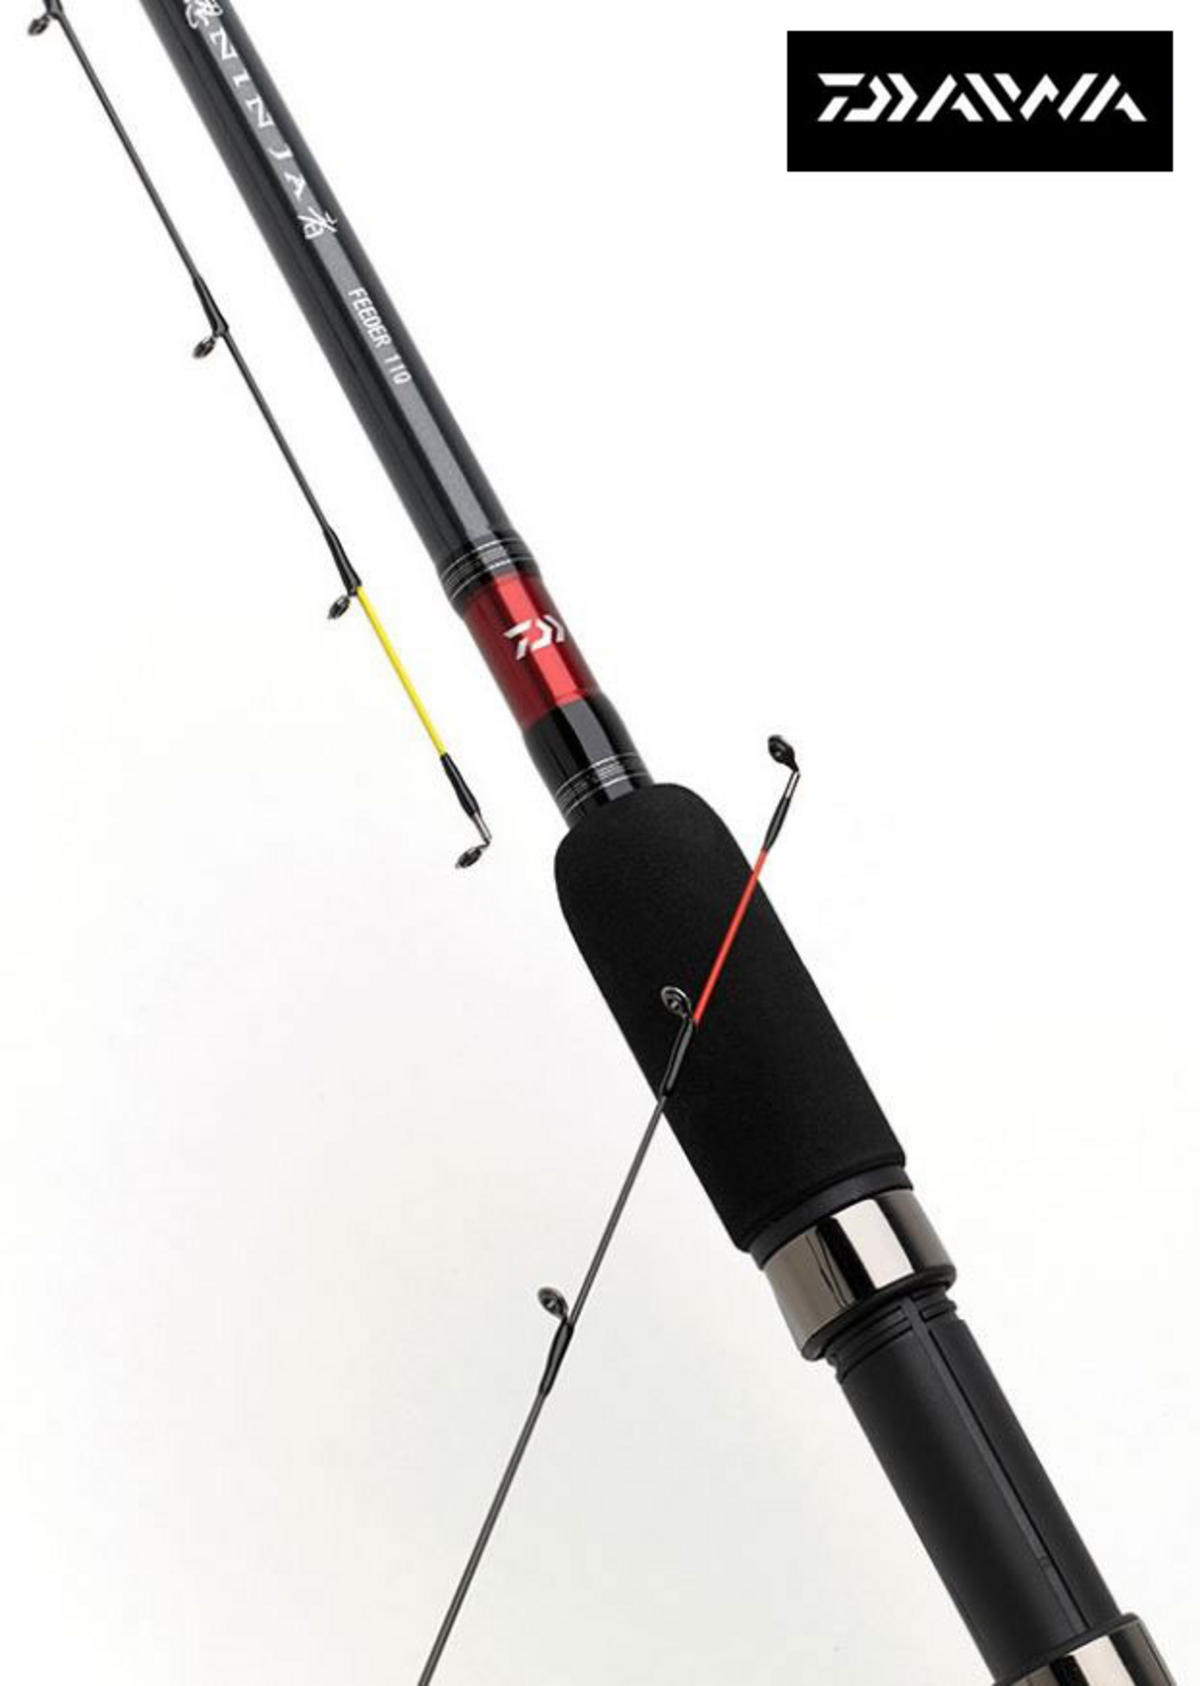 Ex Display Daiwa Ninja Feeder Fishing Rods 11ft 2pc Model No. NJF11Q-AU